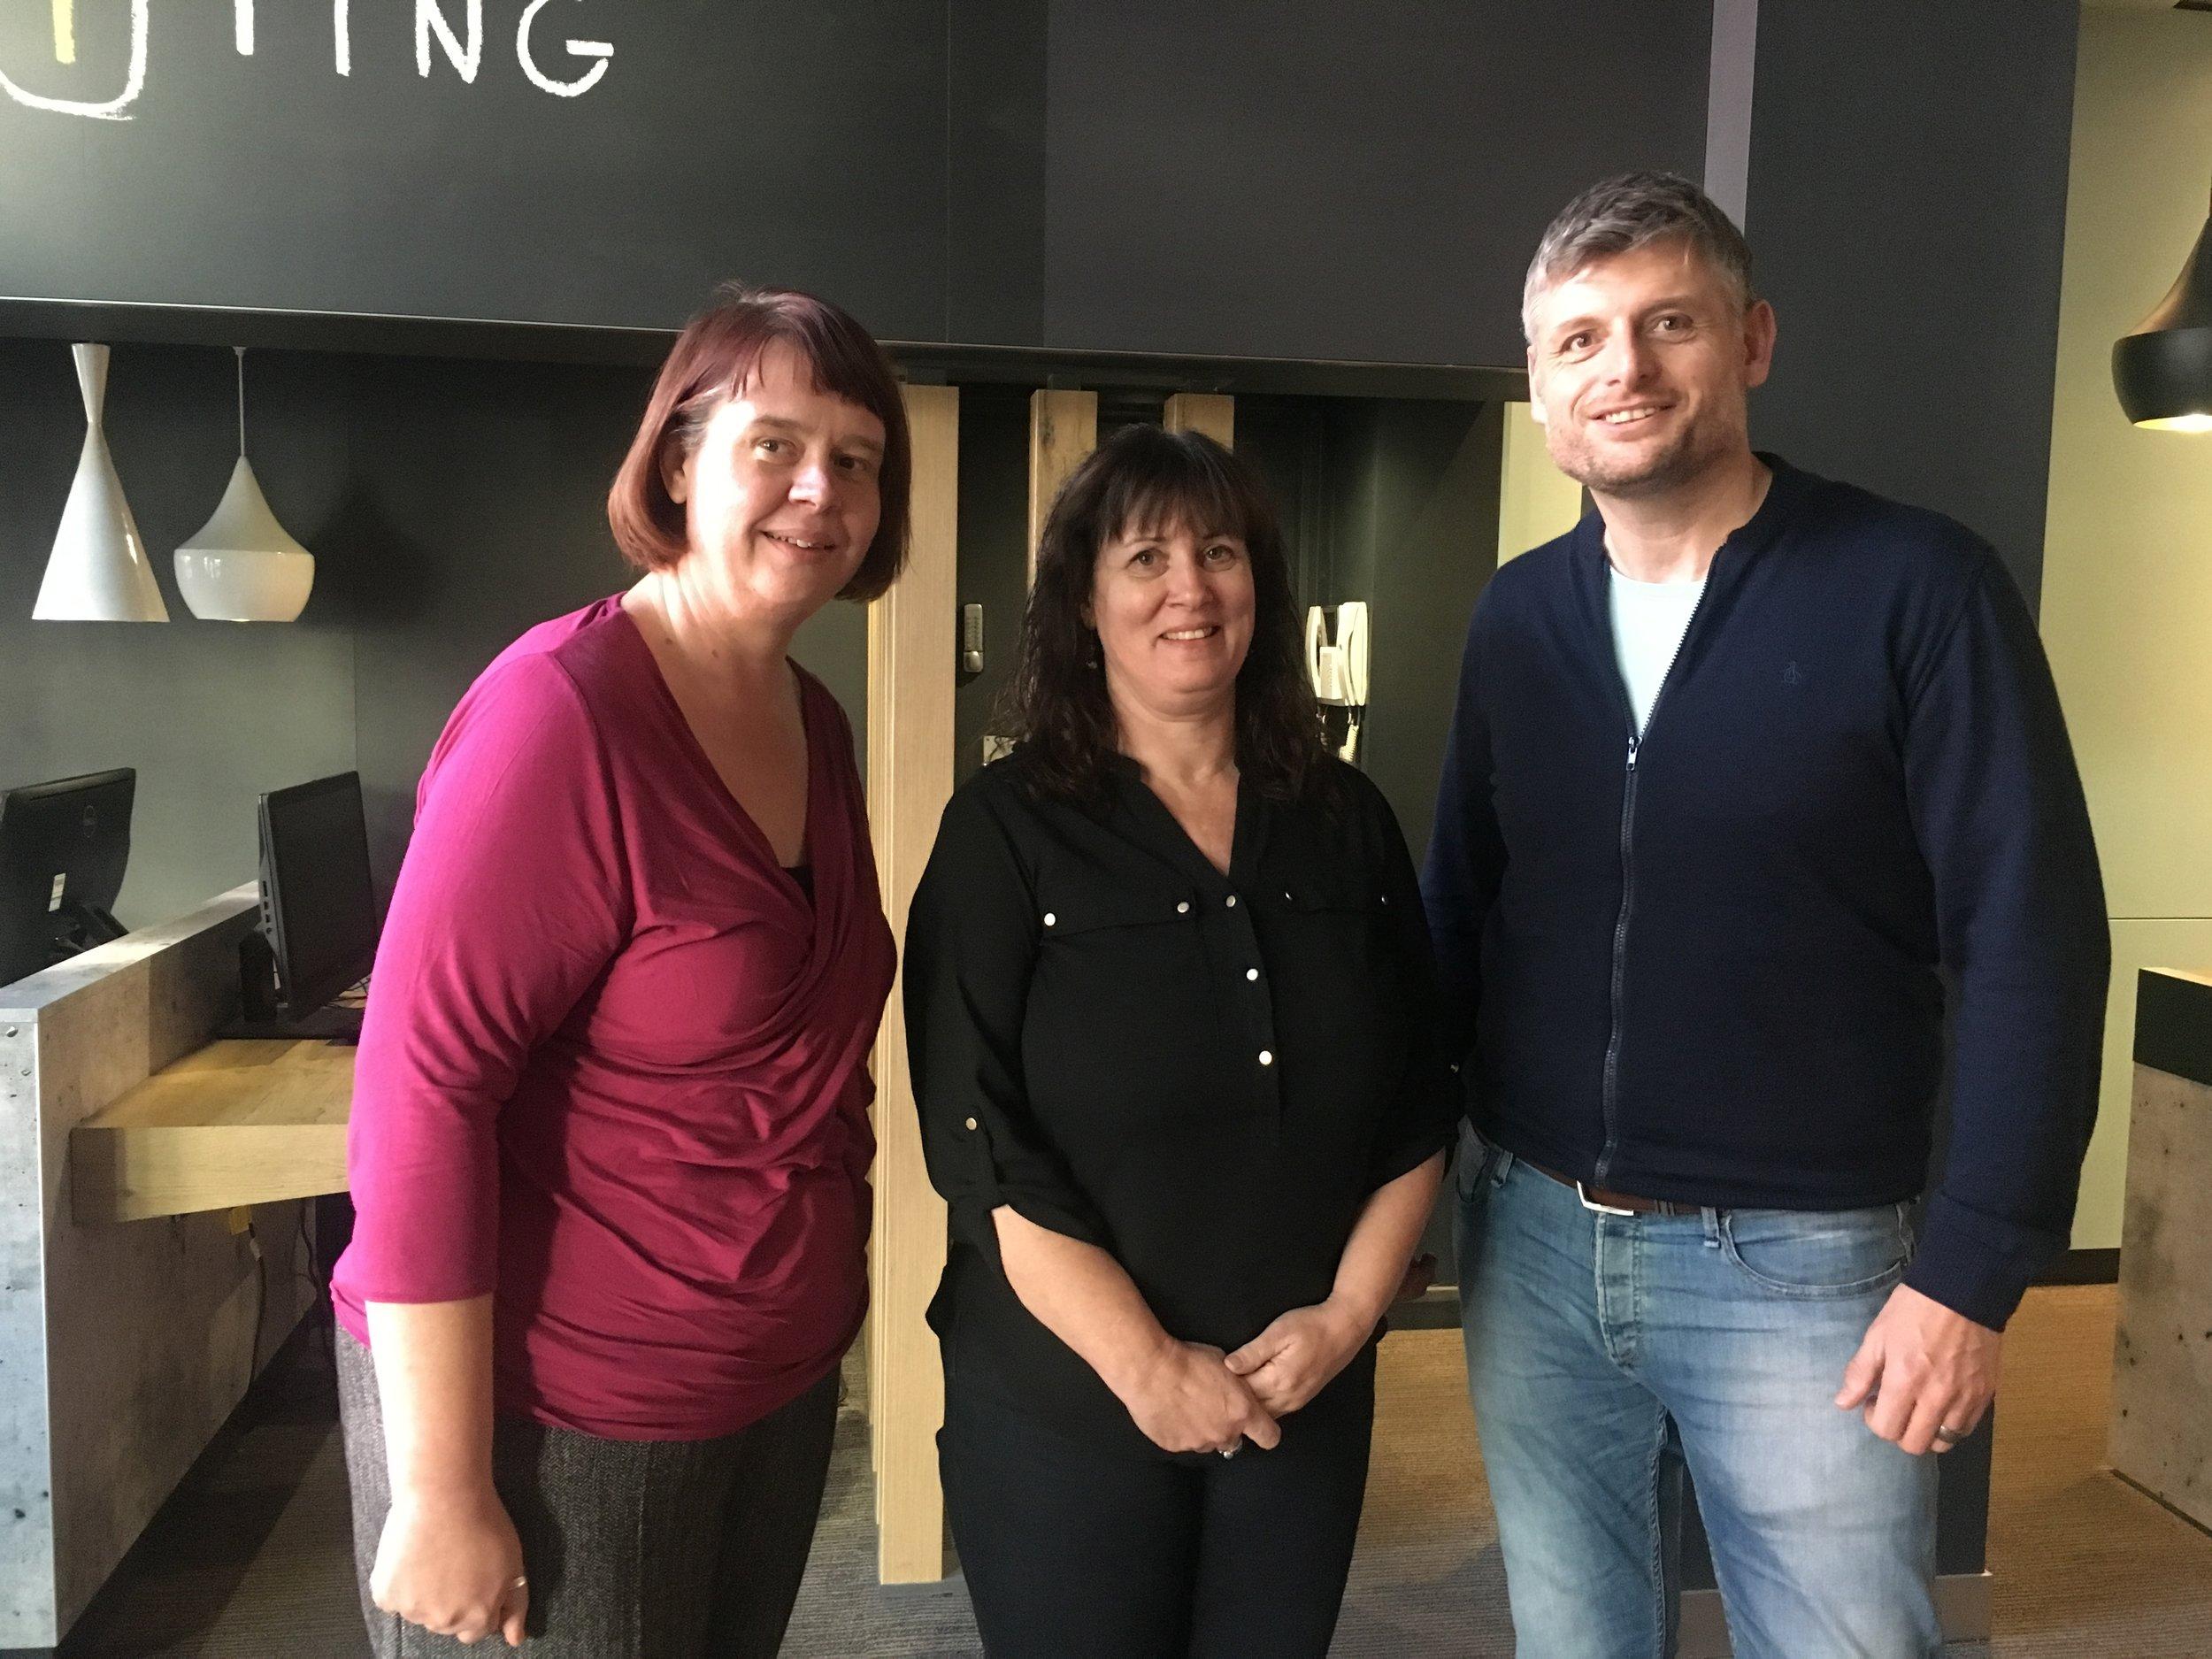 Emma Nelson (Registered Care Manager), Debra Eason (Principal), Ian Thorsteinsson (Regional Manager - Children's Services)